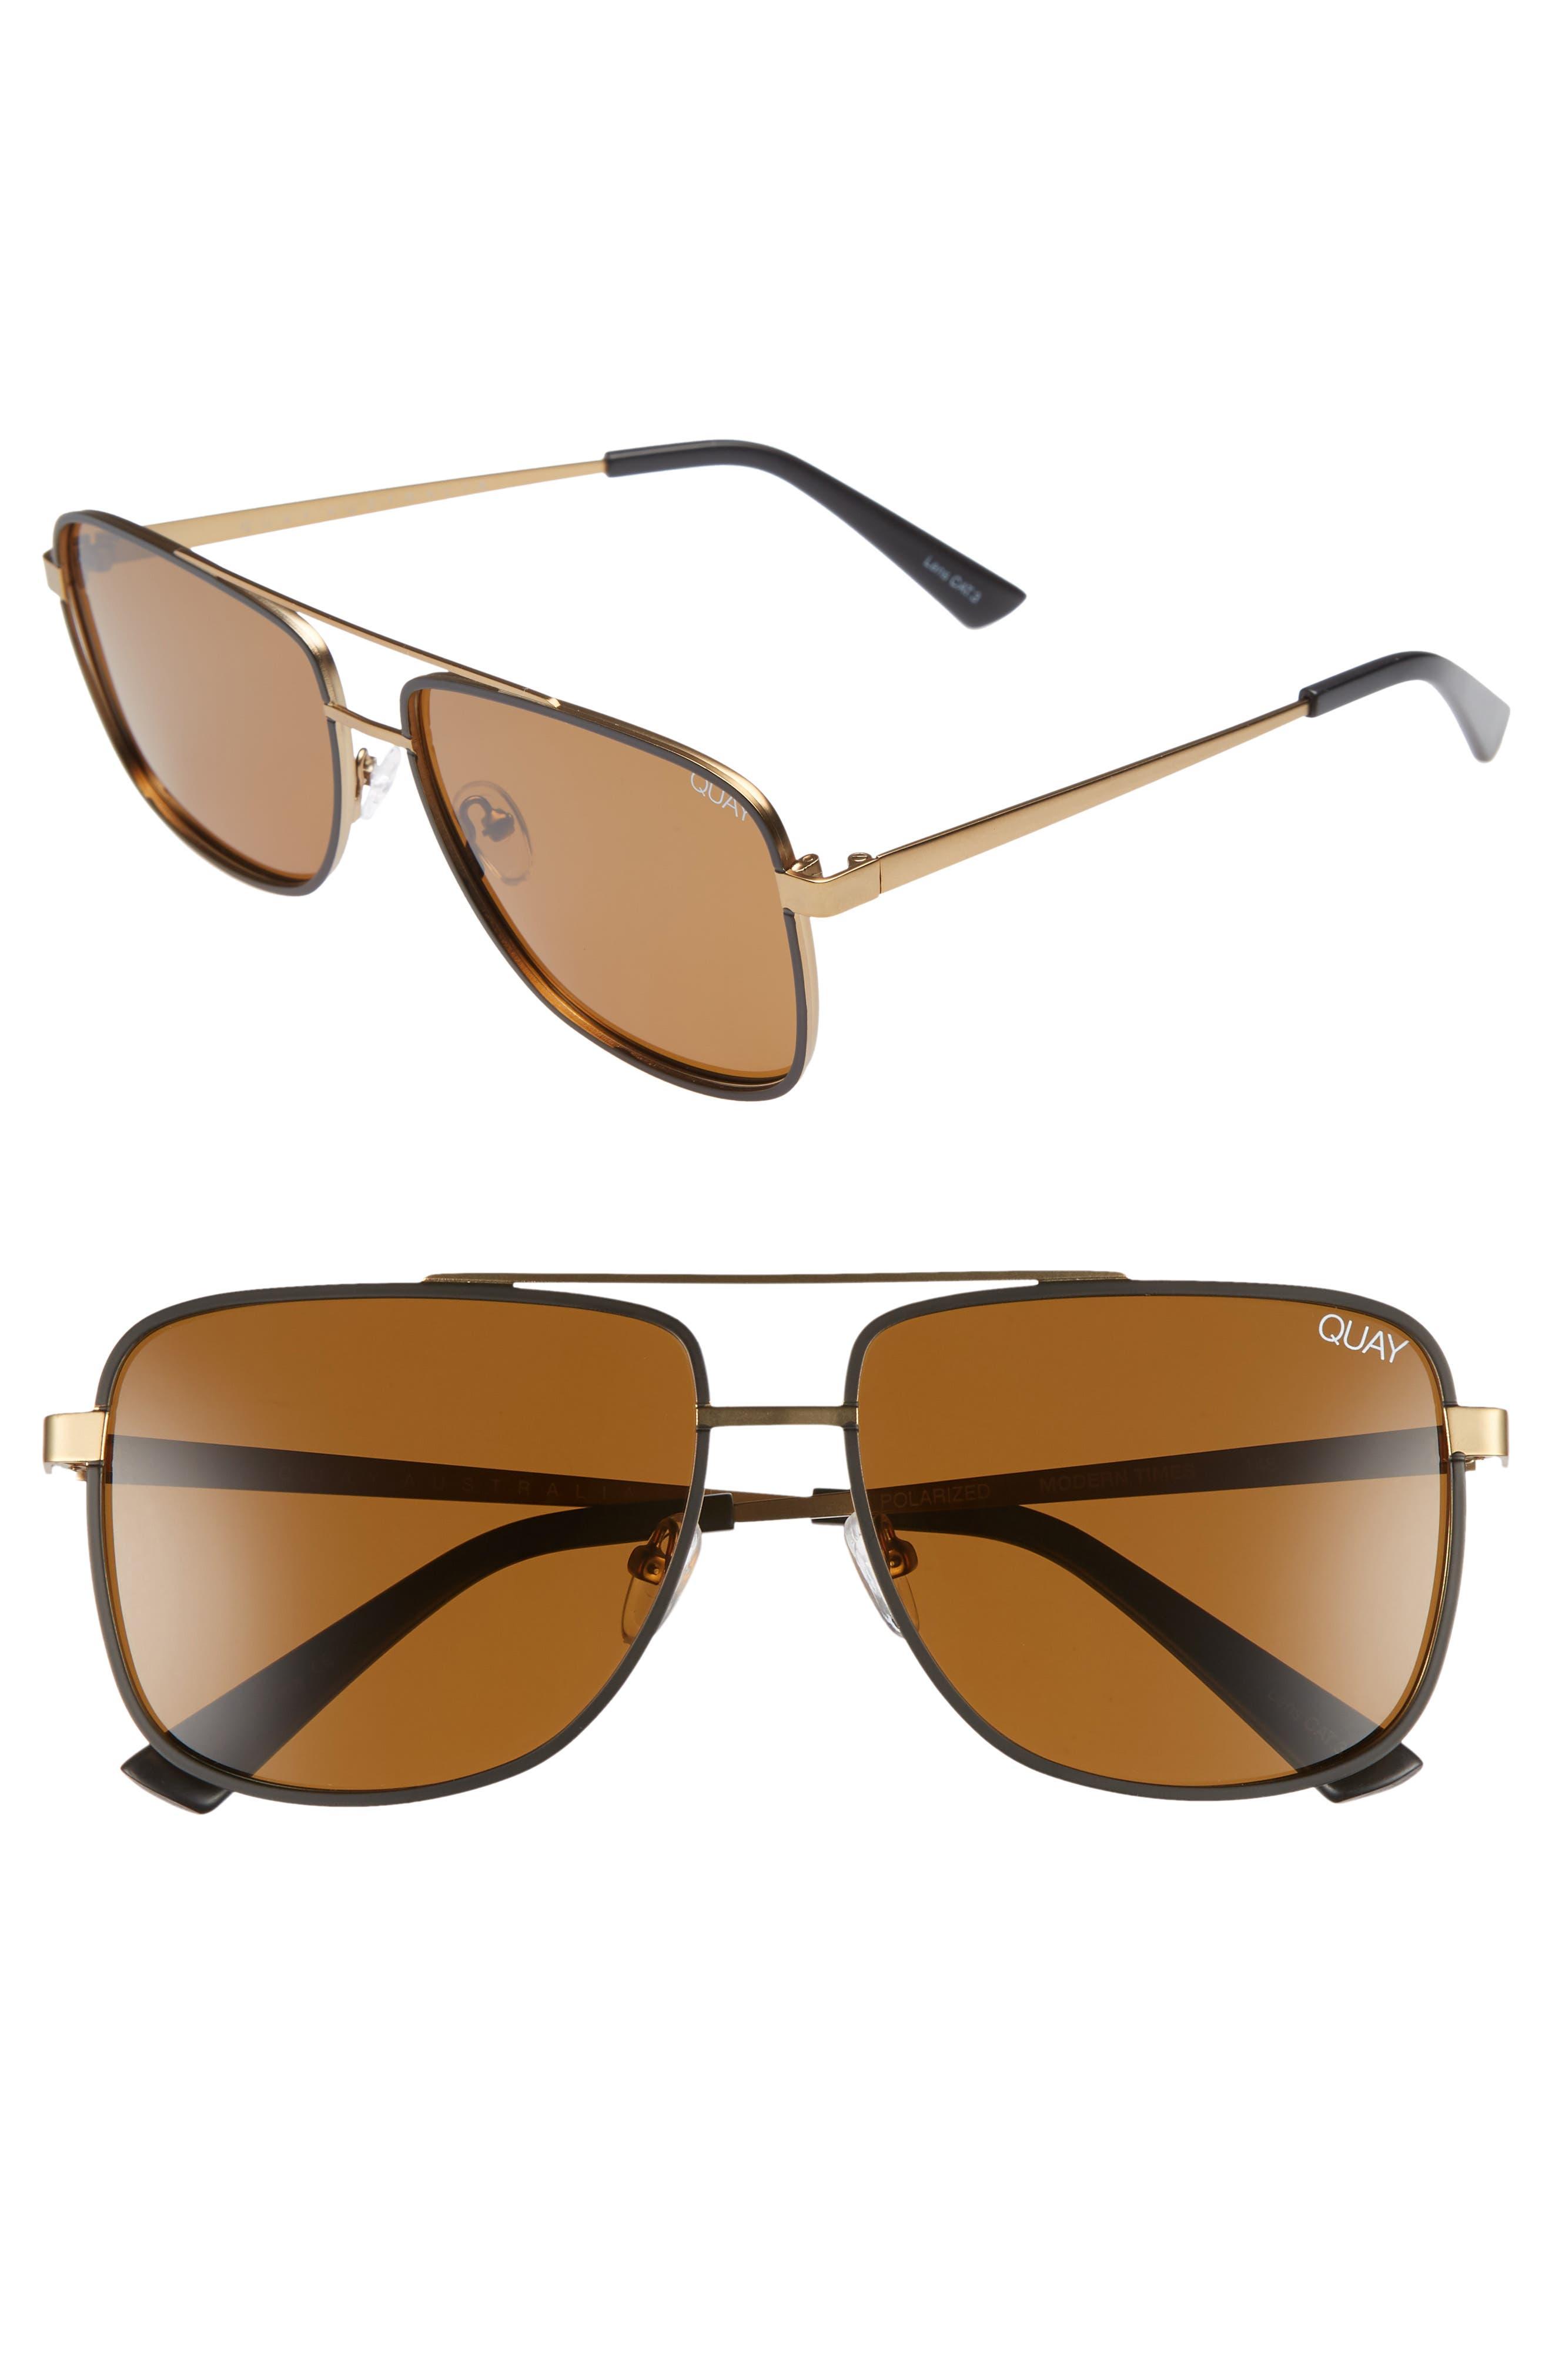 Modern Times 57mm Polarized Aviator Sunglasses,                         Main,                         color, BRONZE BLACK / BROWN LENS